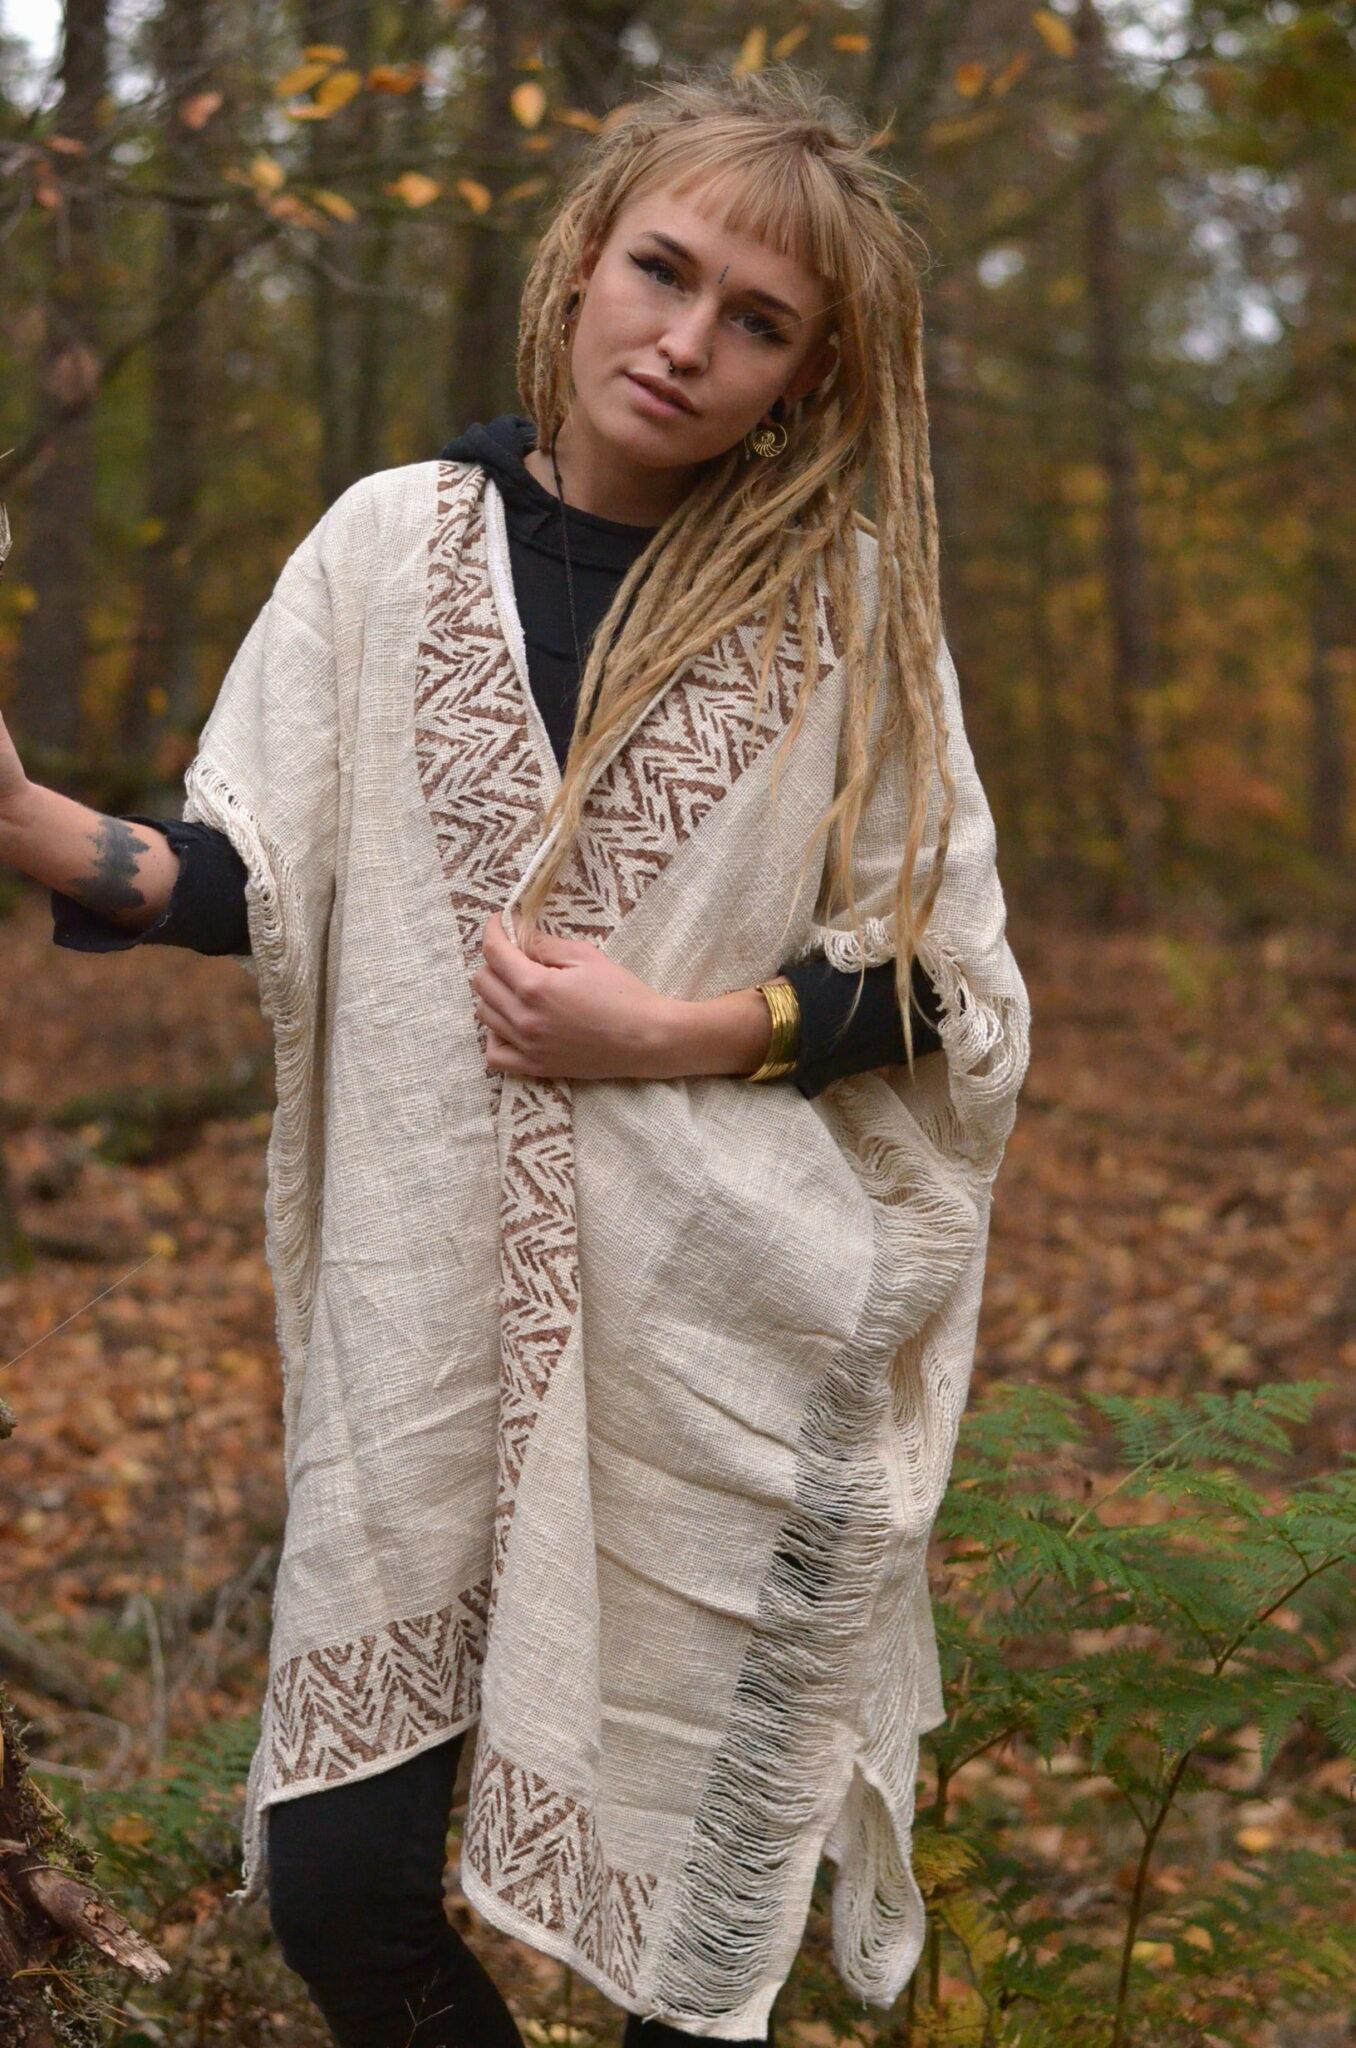 weste-hippie-natural-style-gypsy-fairy-fantasy